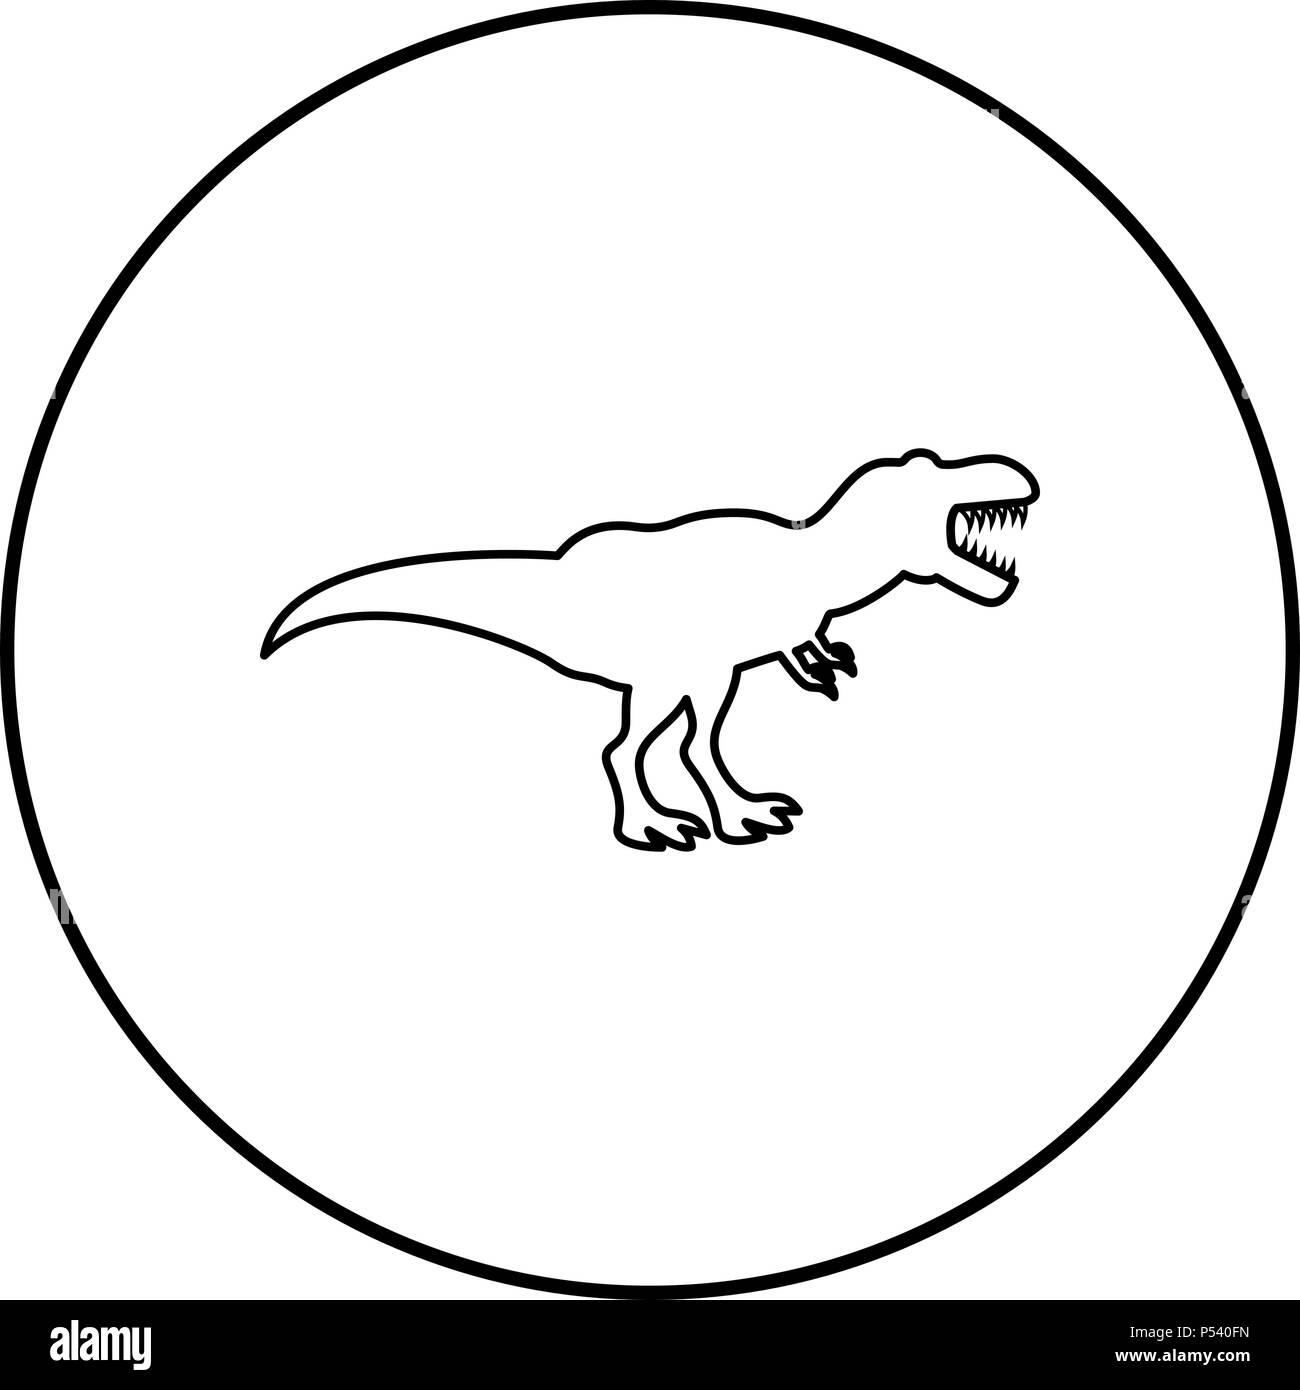 Dinosaur tyrannosaurus t rex icon black color in circle round outline - Stock Image